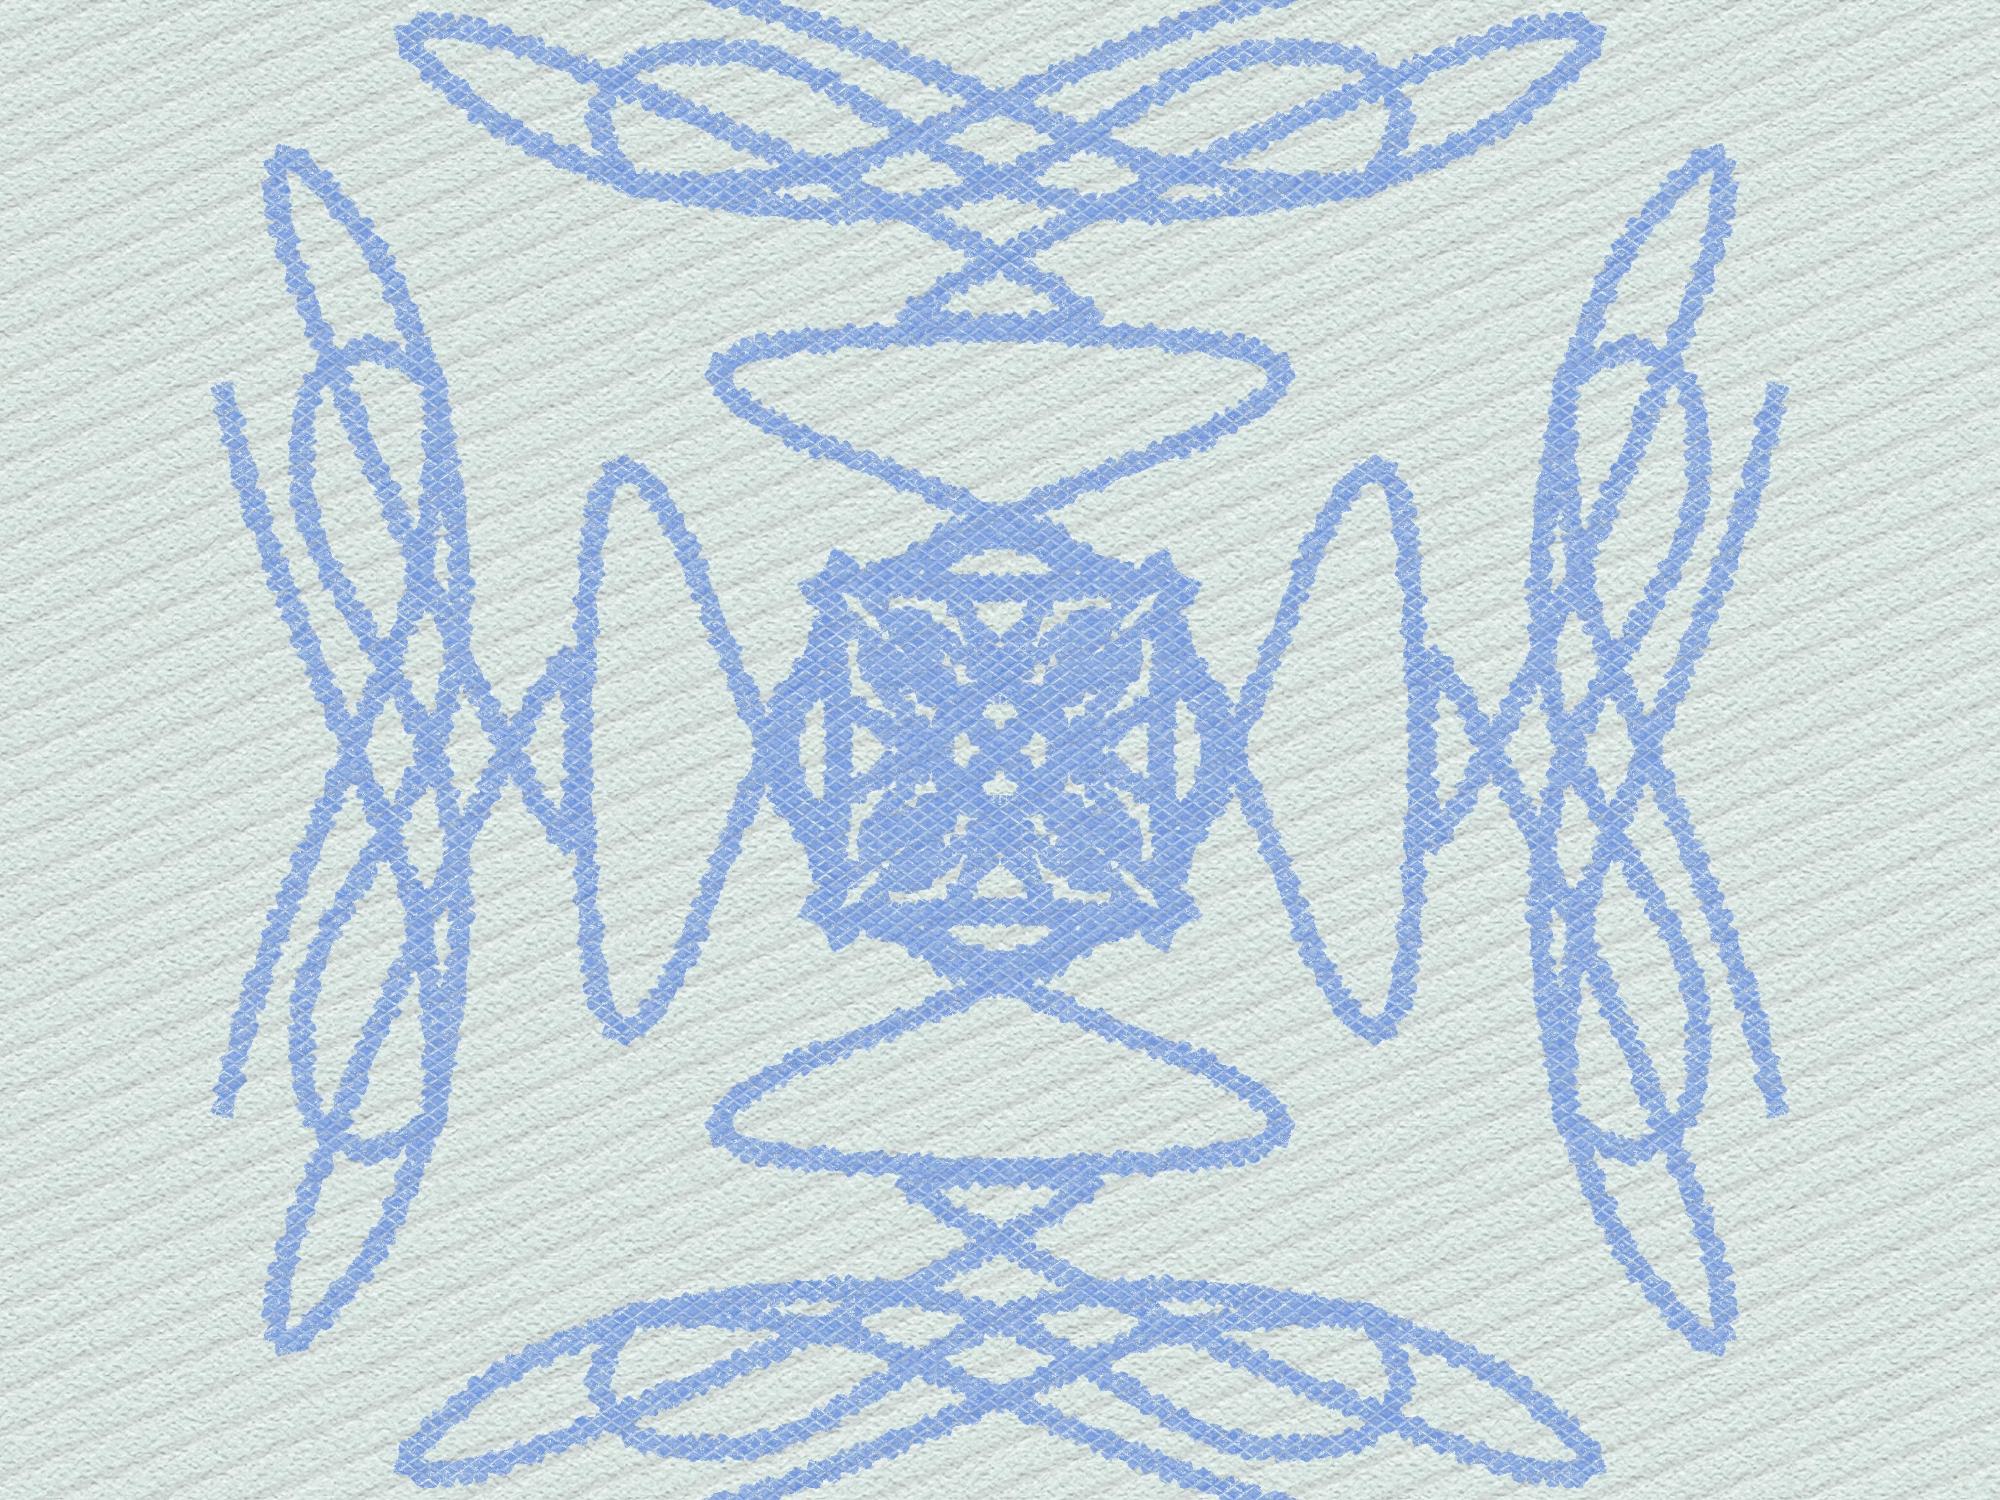 A design made with line arts